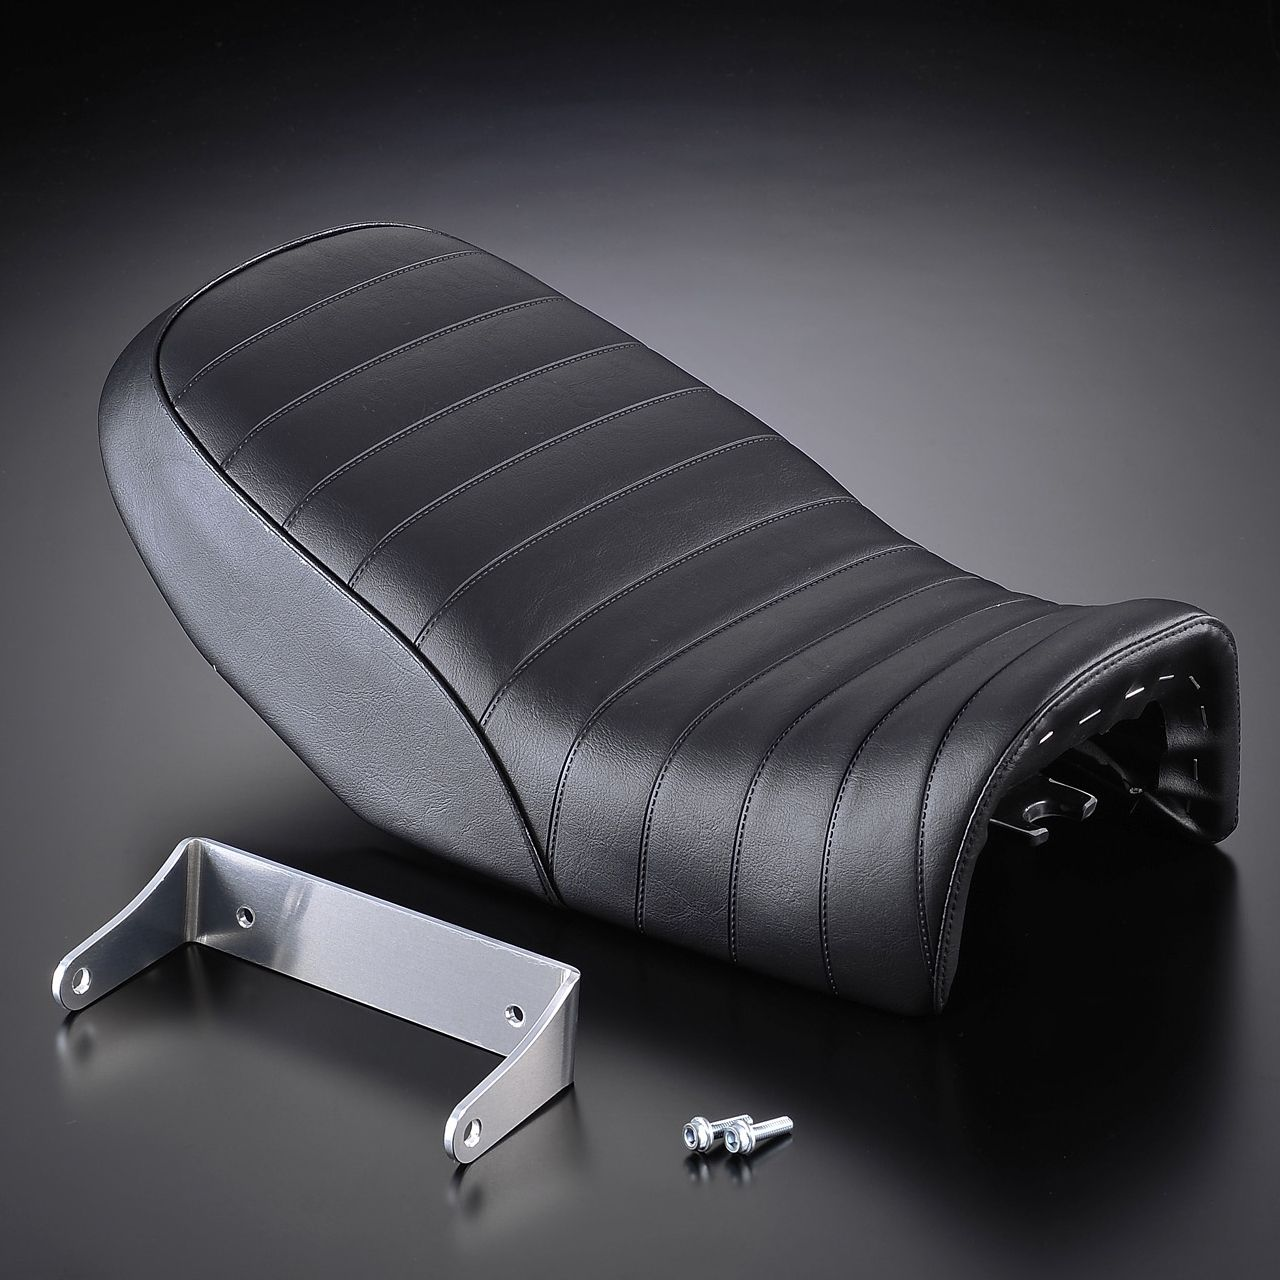 【G-Craft】GDF 改裝座墊 - 「Webike-摩托百貨」